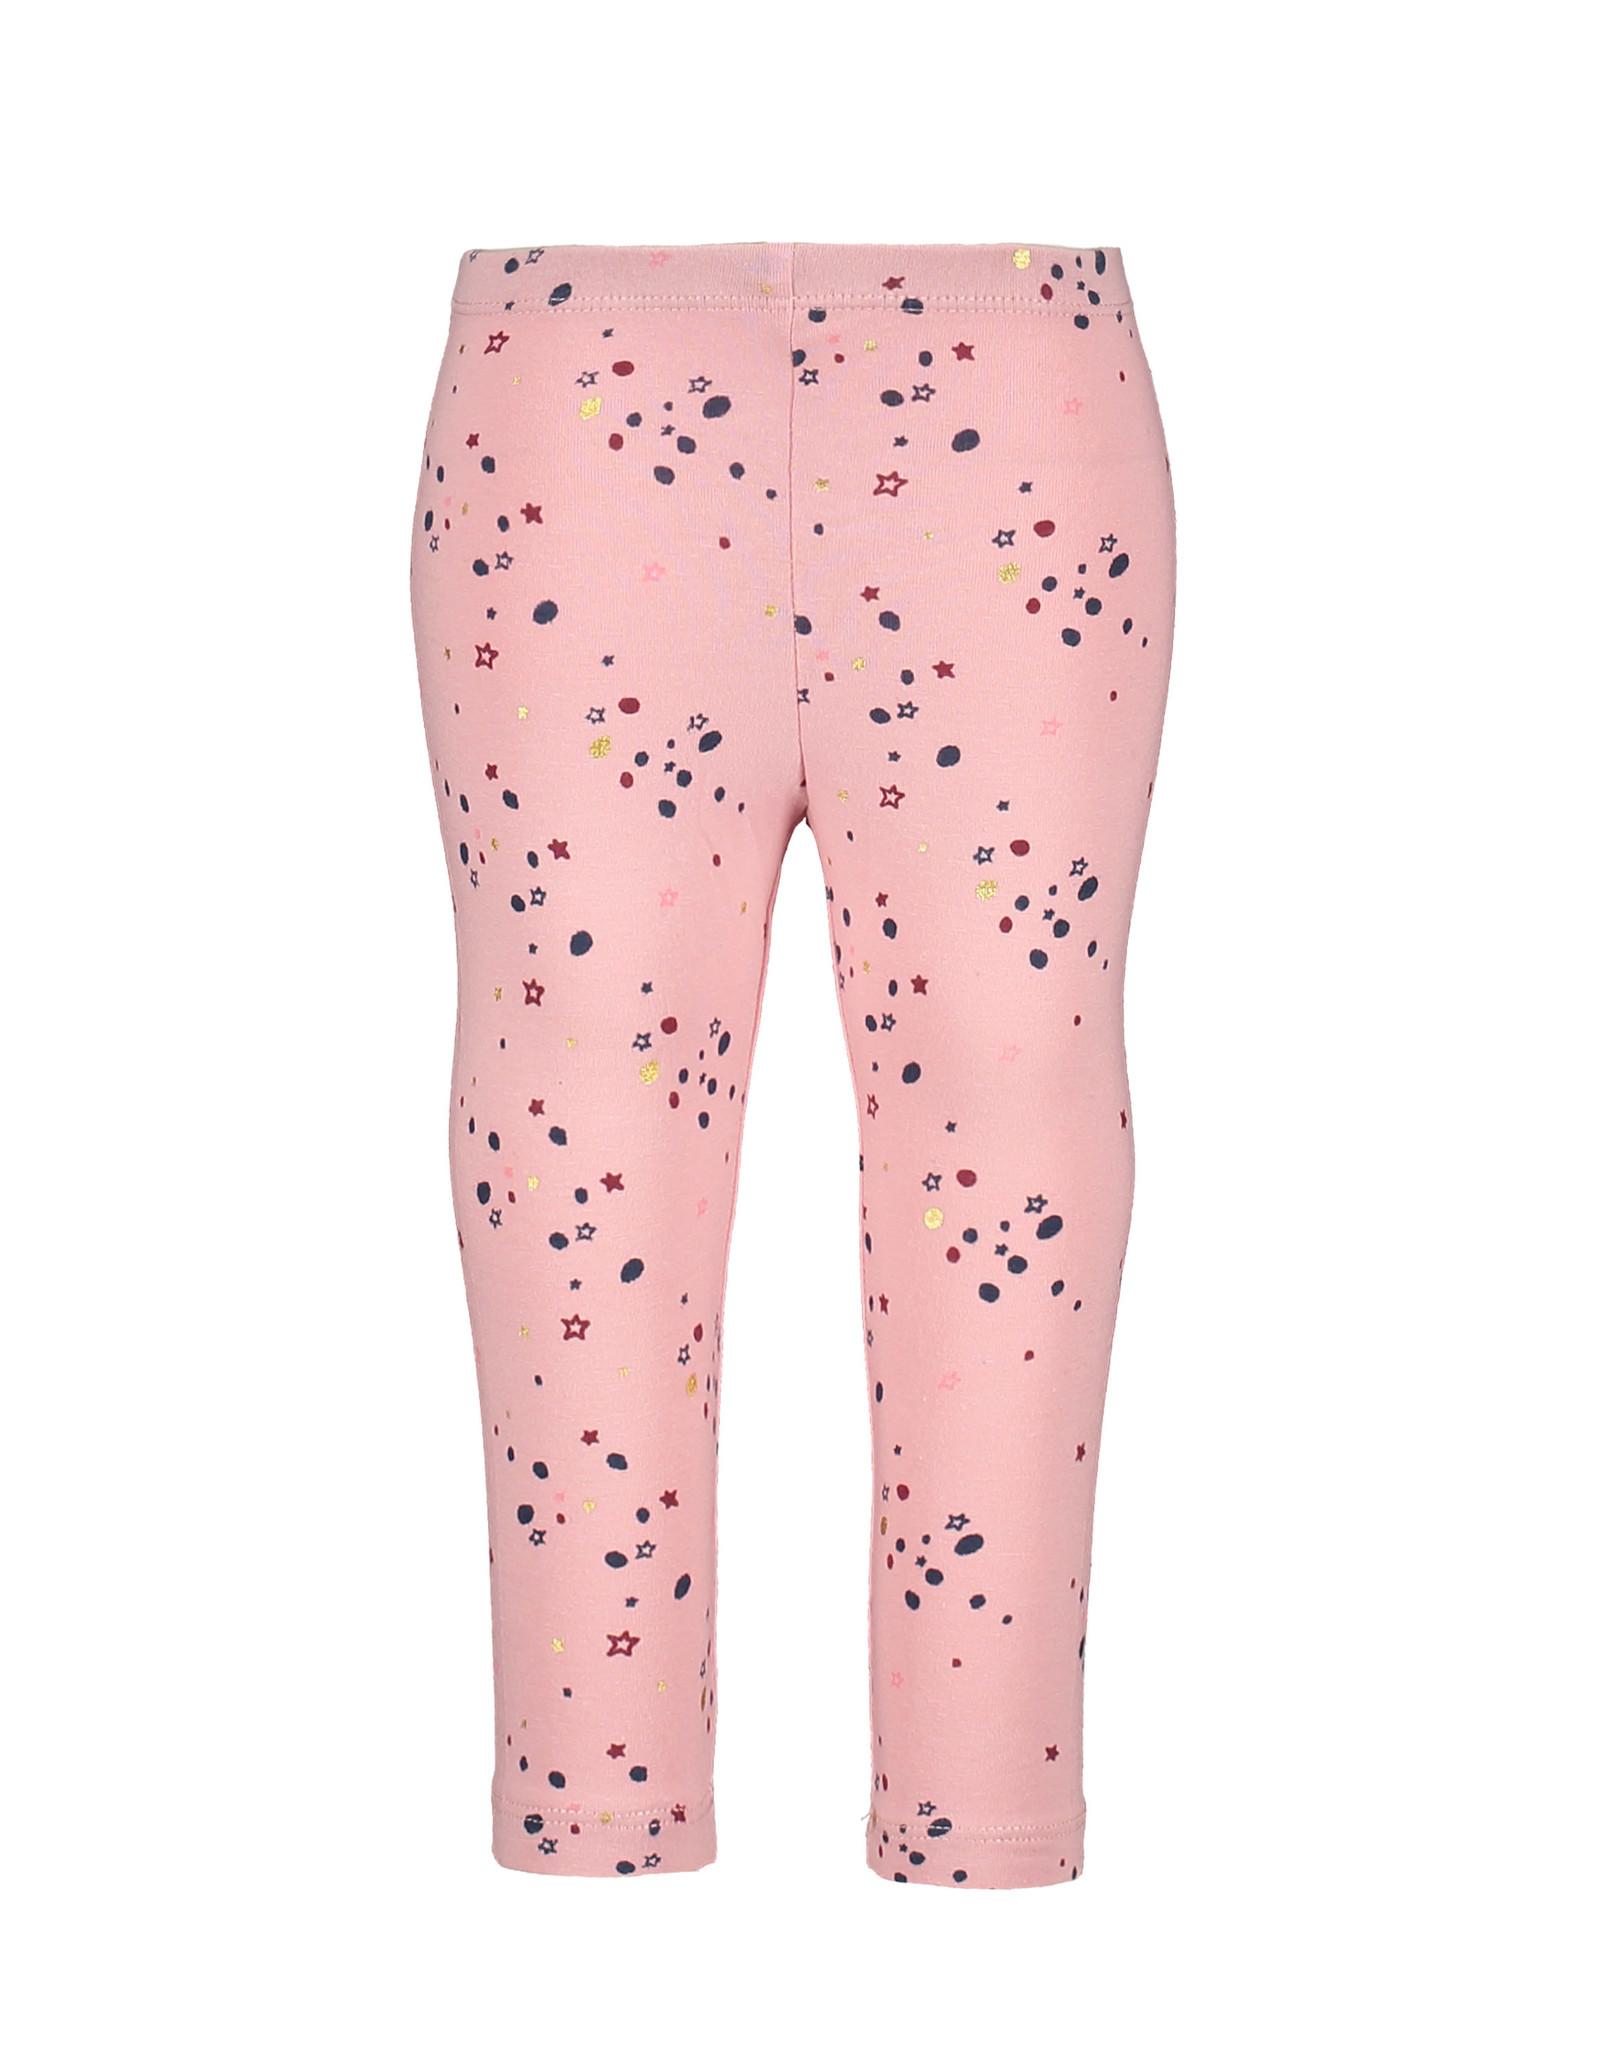 Bampidano Little Bampidano Baby Girls legging Bindi plain/allover print SWEET, light pink AO